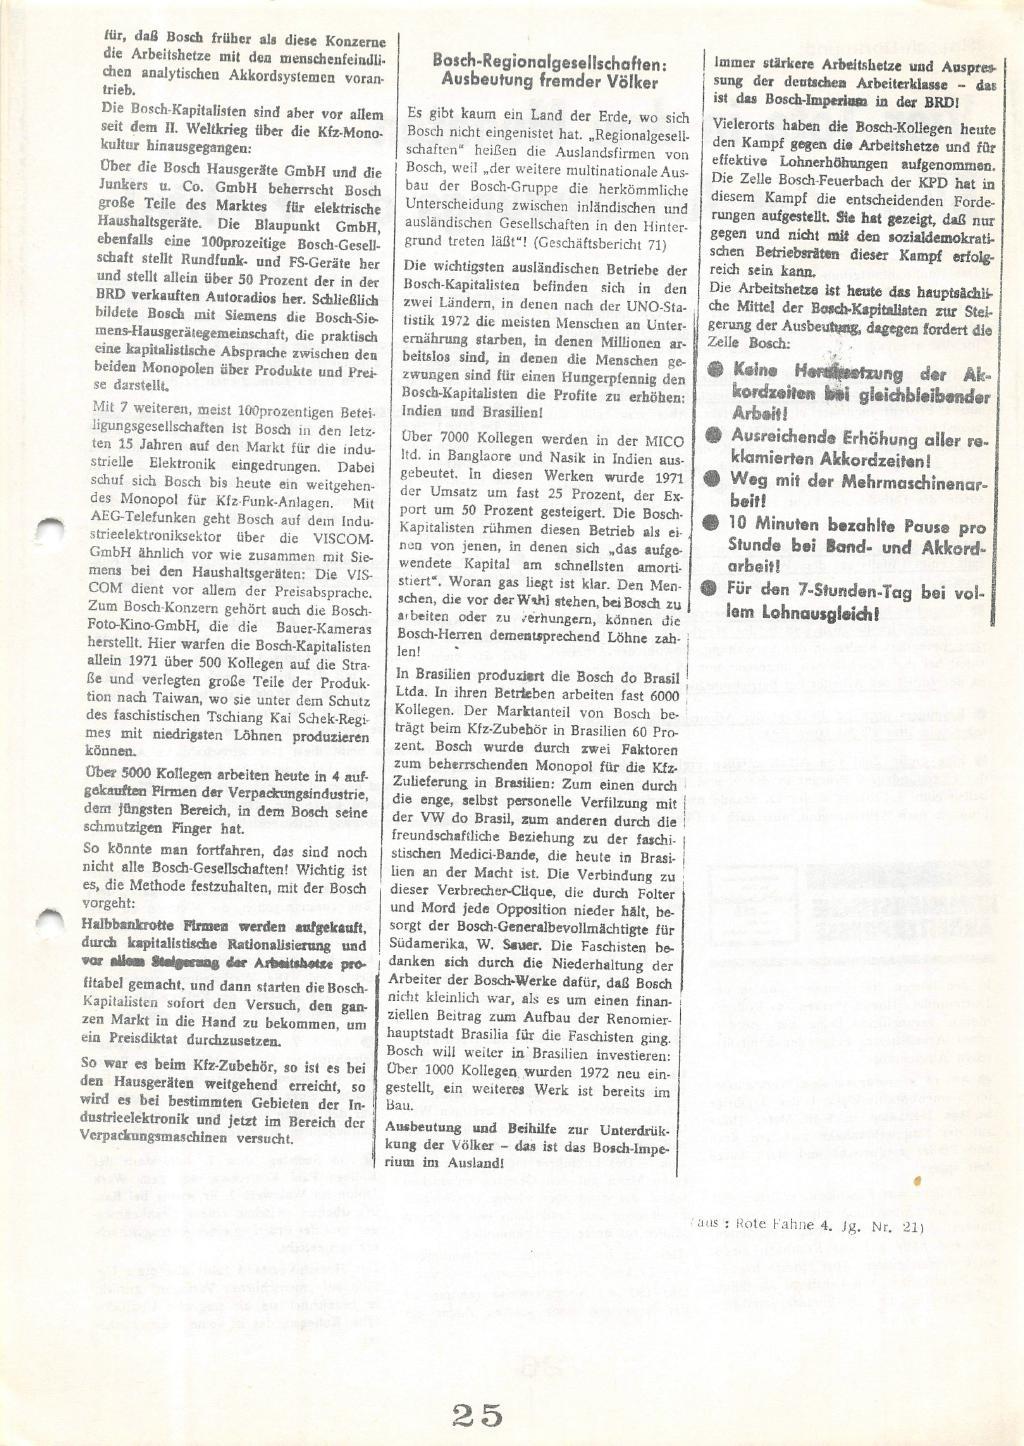 KSV_Grundschulung_1975_01_44